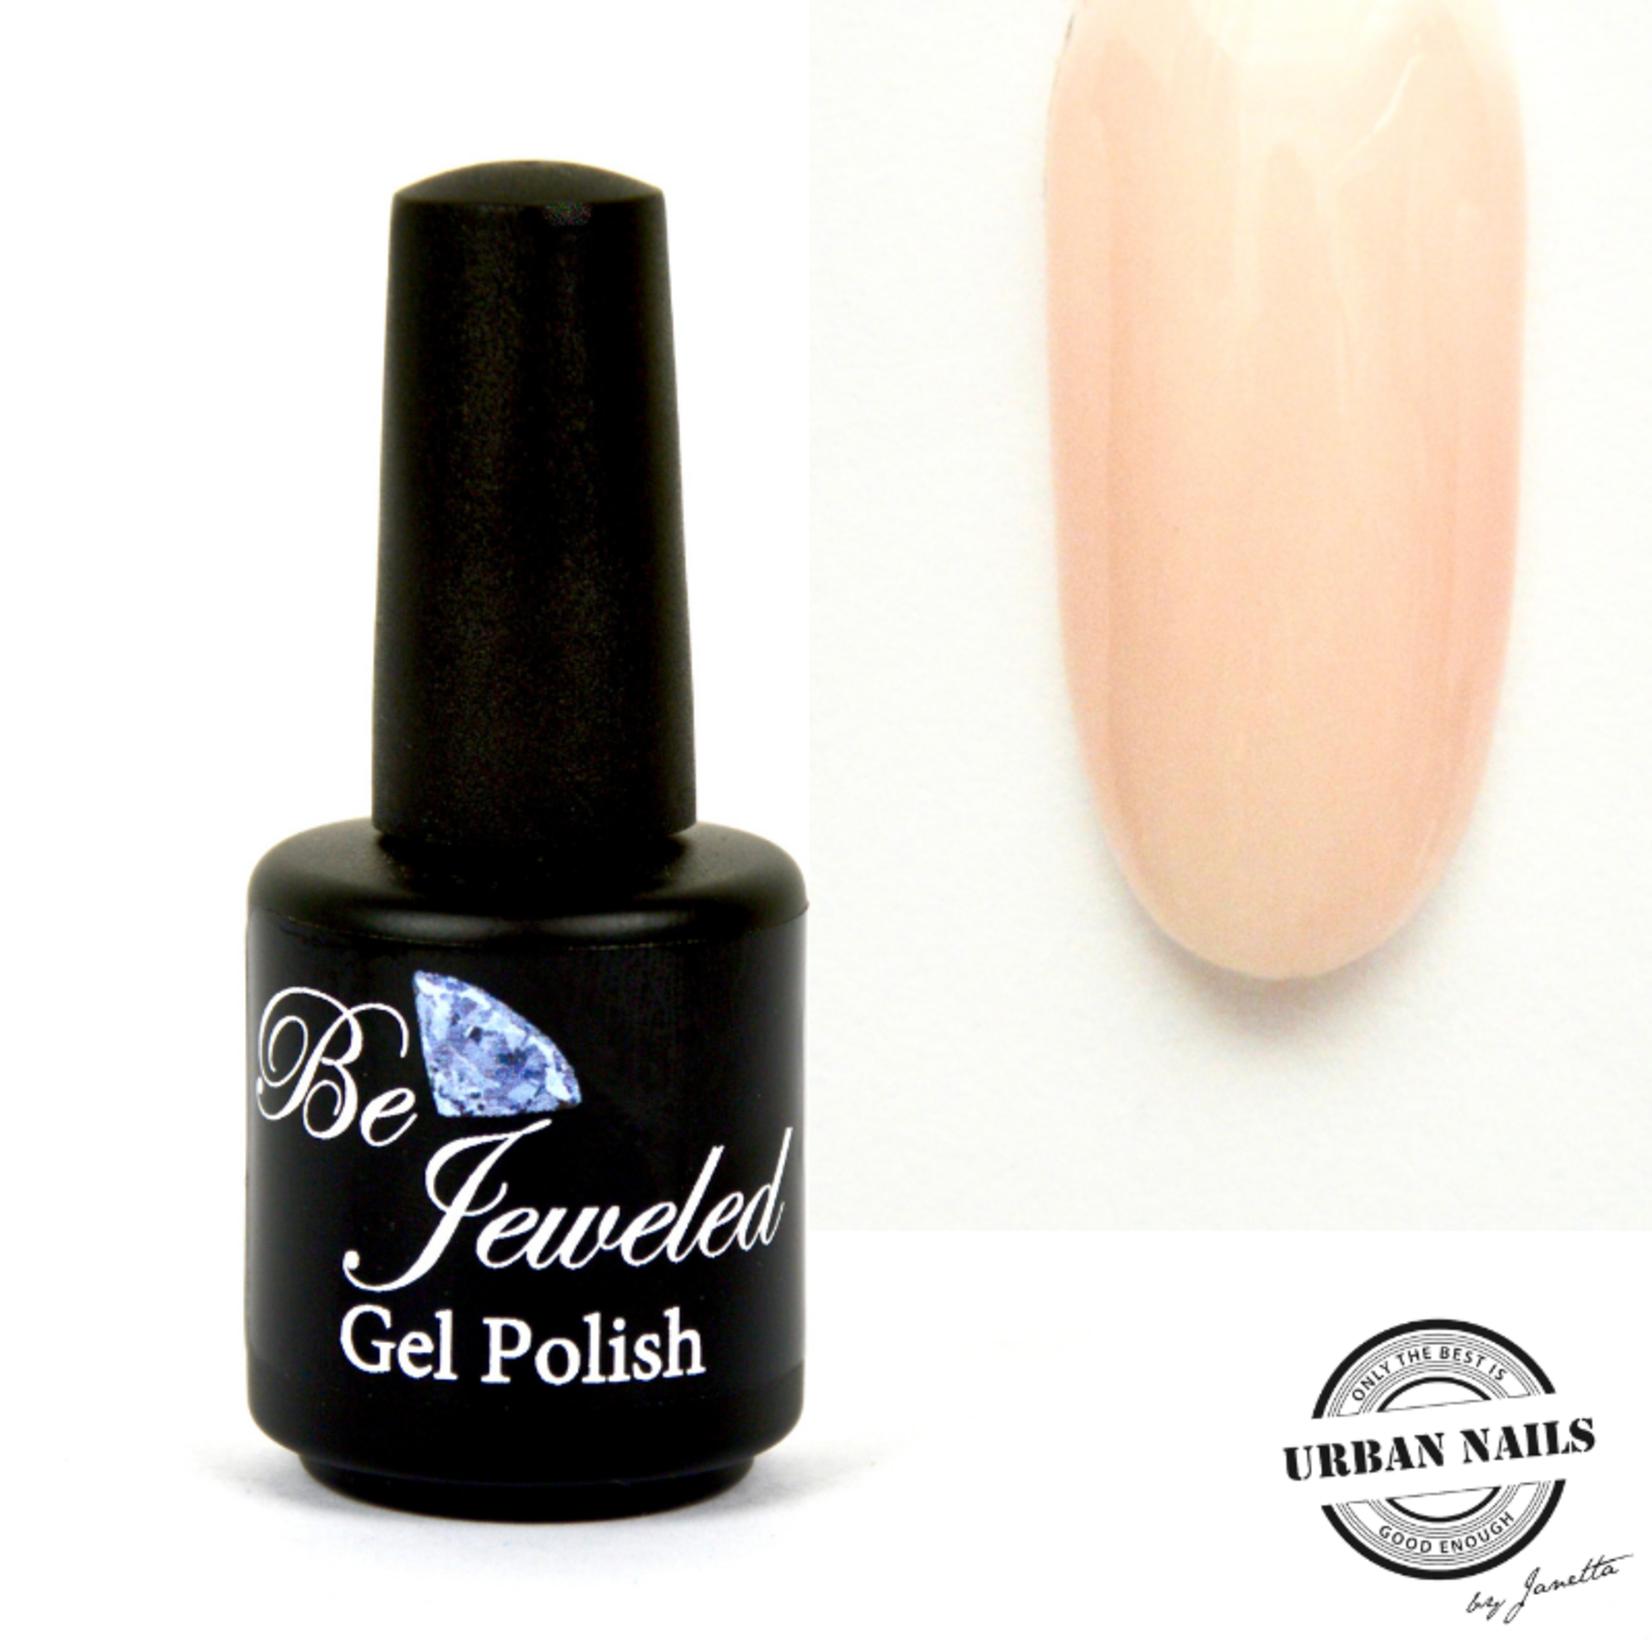 Urban Nails Be Jeweled Gelpolish 03 French Manicure Pink